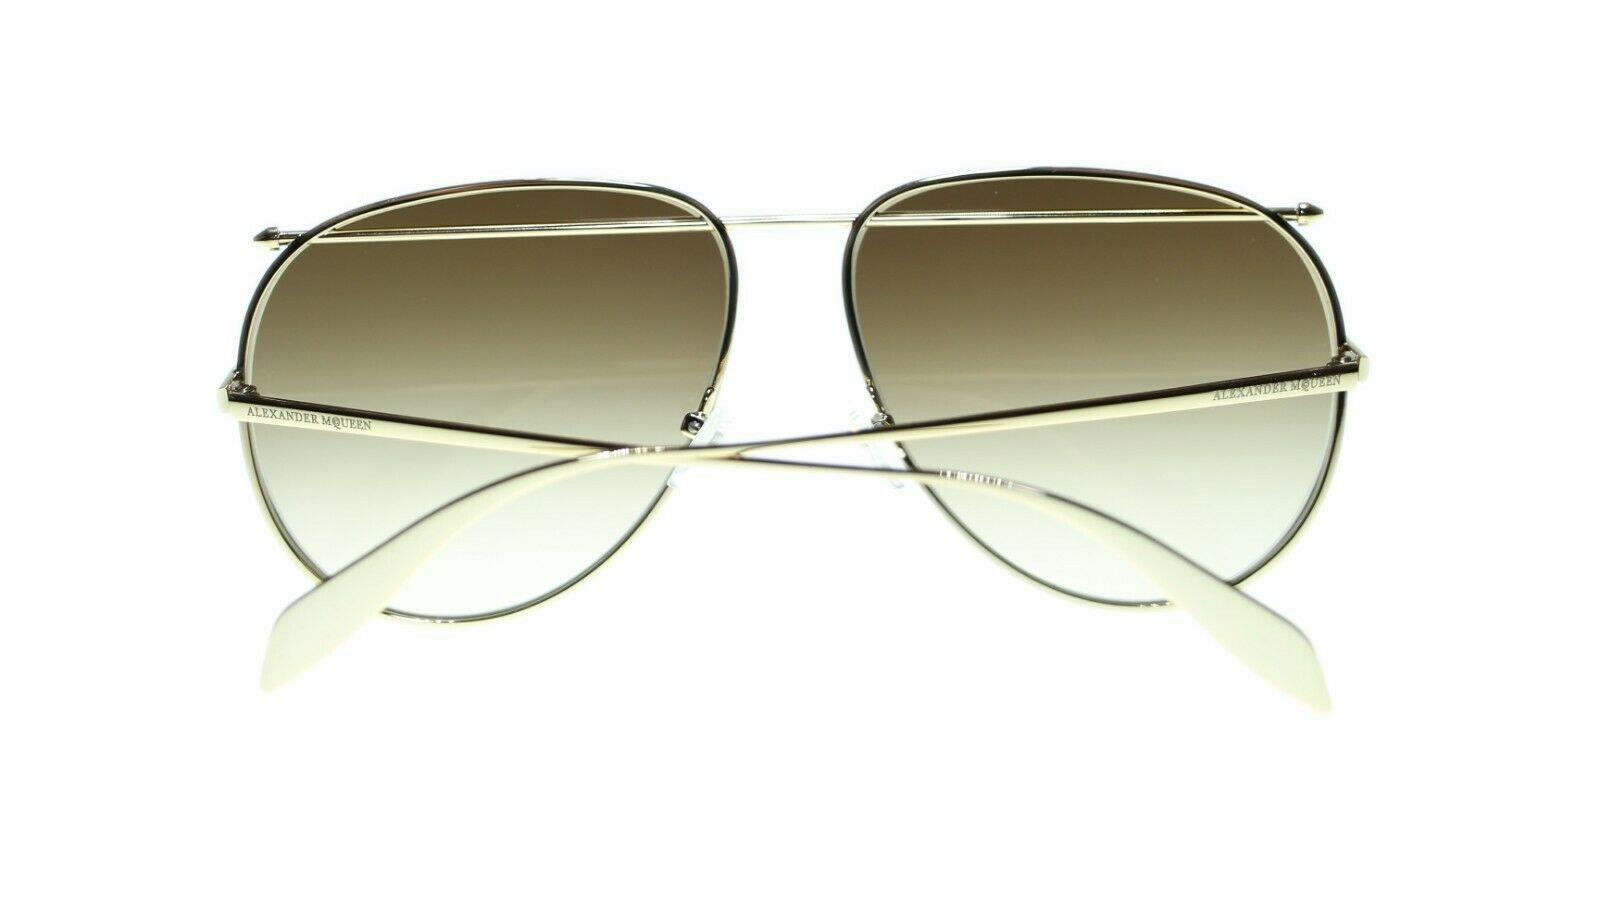 Alexander Mcqueen AM0170S 001 Unisex Occhiali da Sole Montatura Metallo